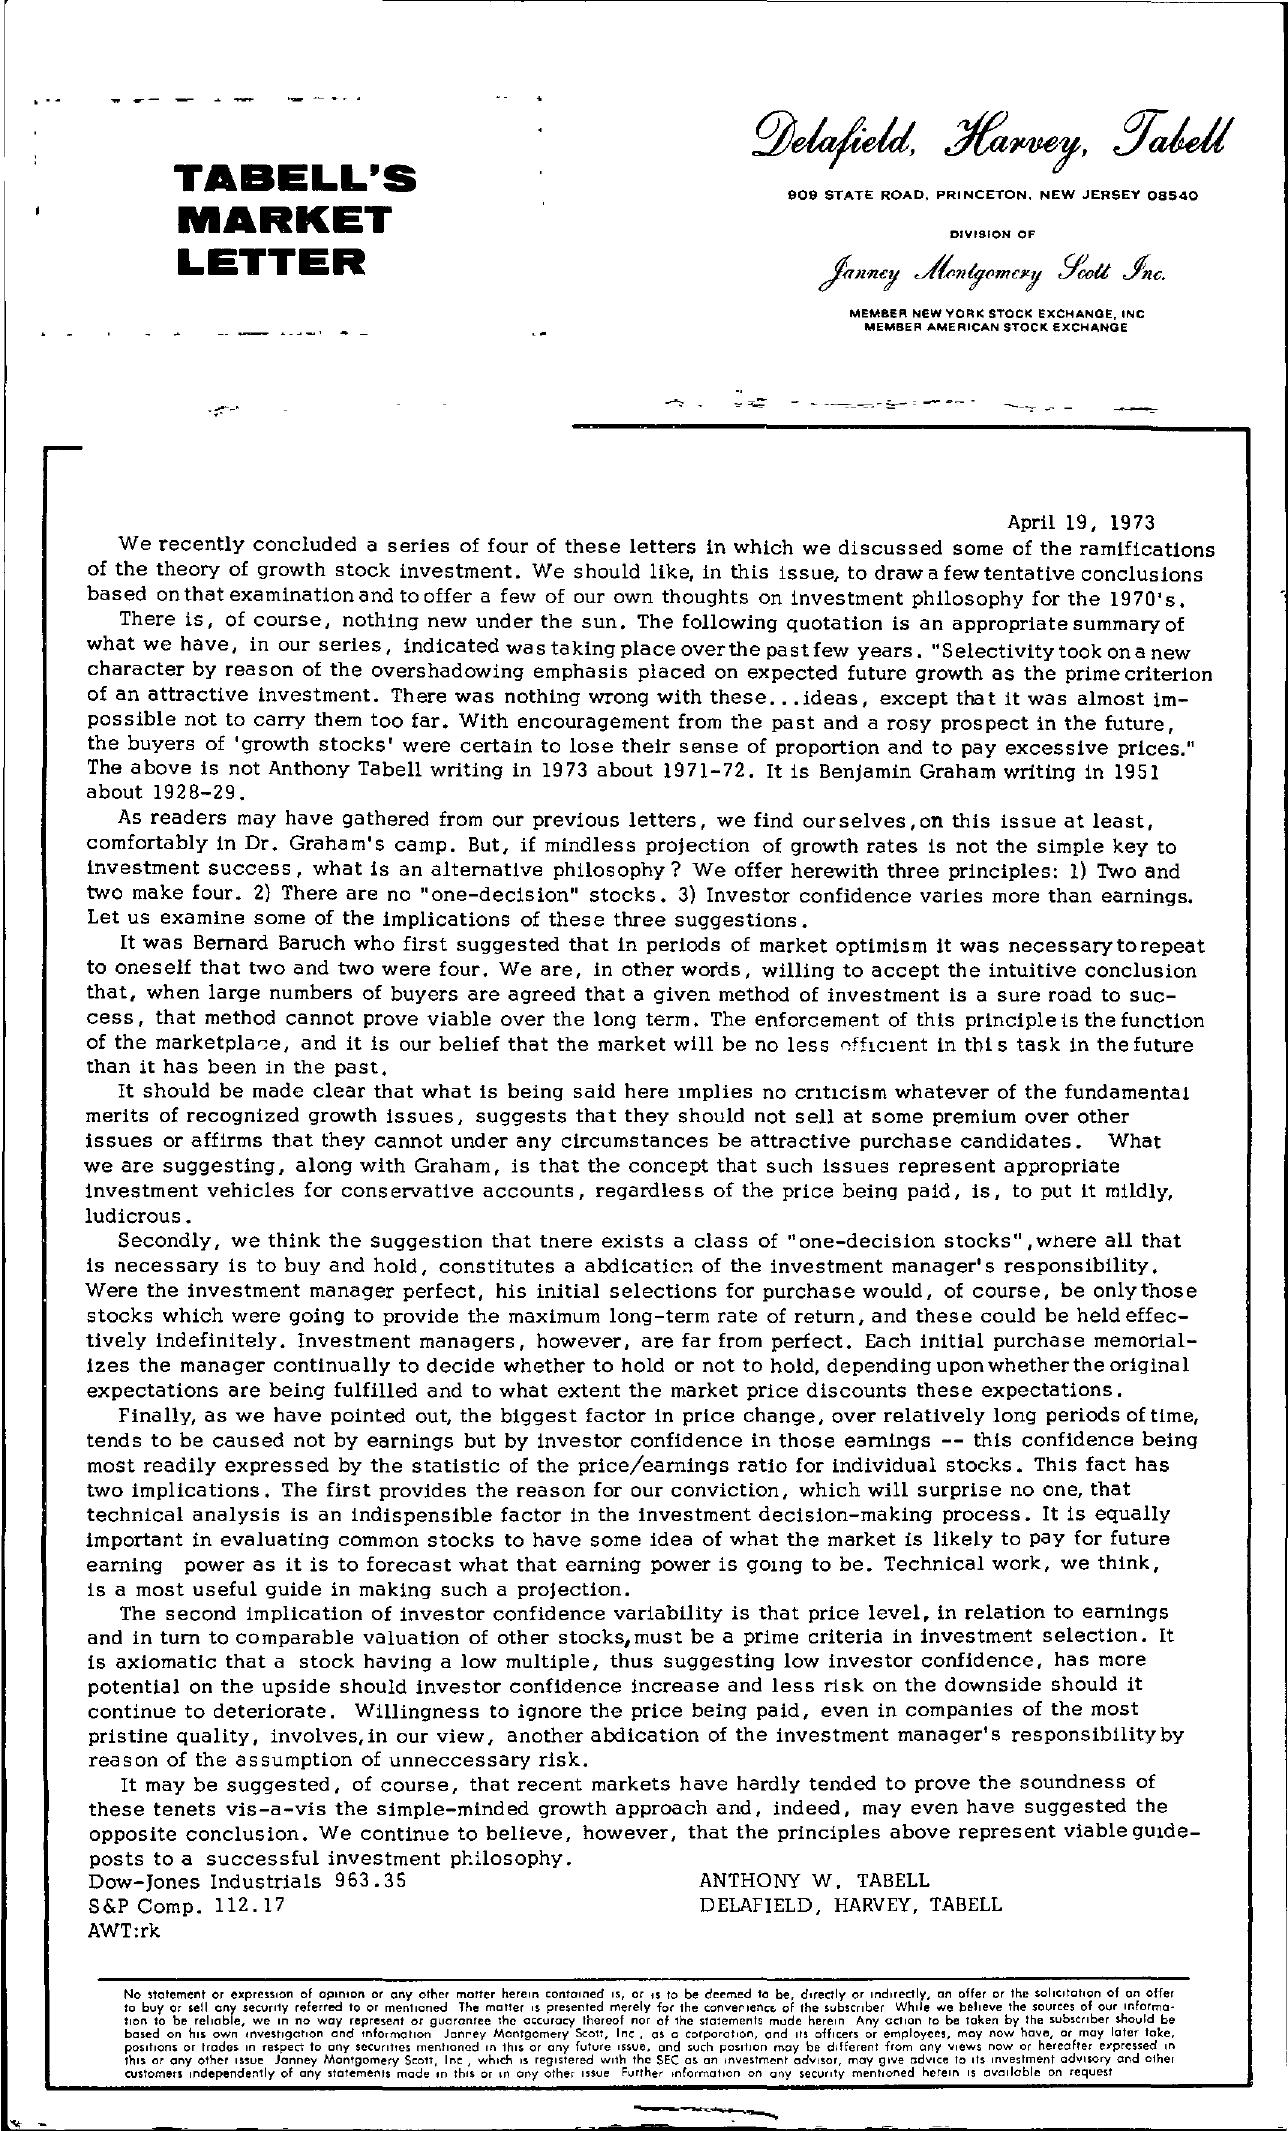 Tabell's Market Letter - April 19, 1973